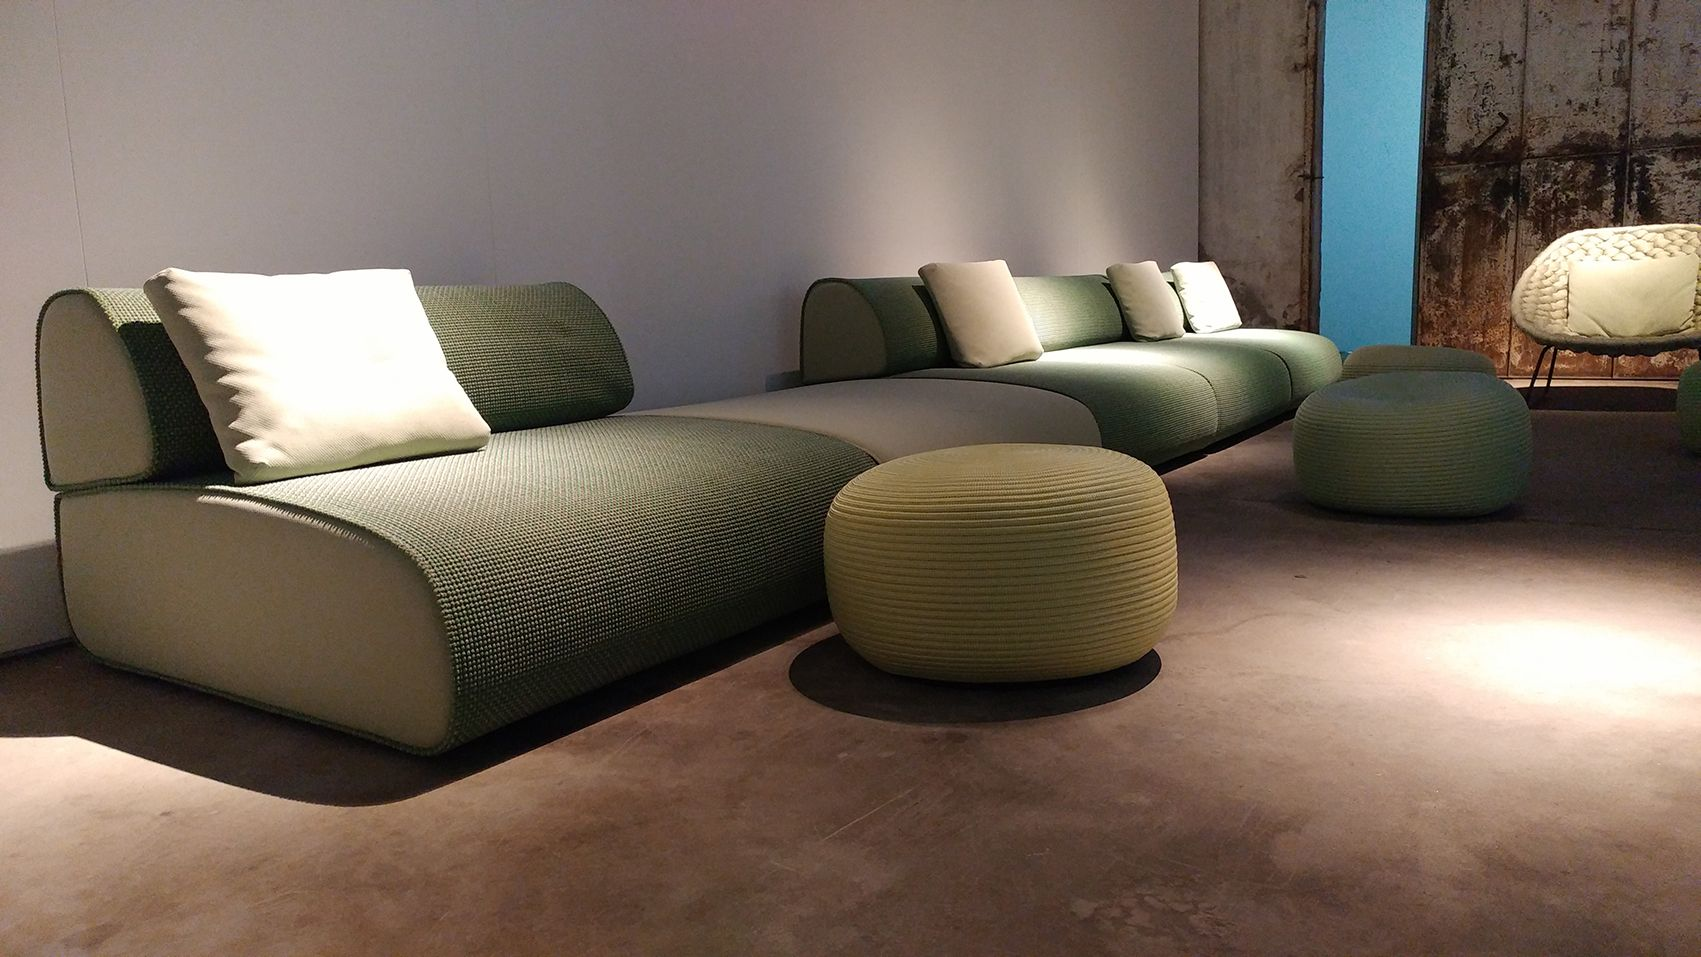 Ola sofa for Paola Lenti by Ramos Bassols | Garden furniture | Pinterest